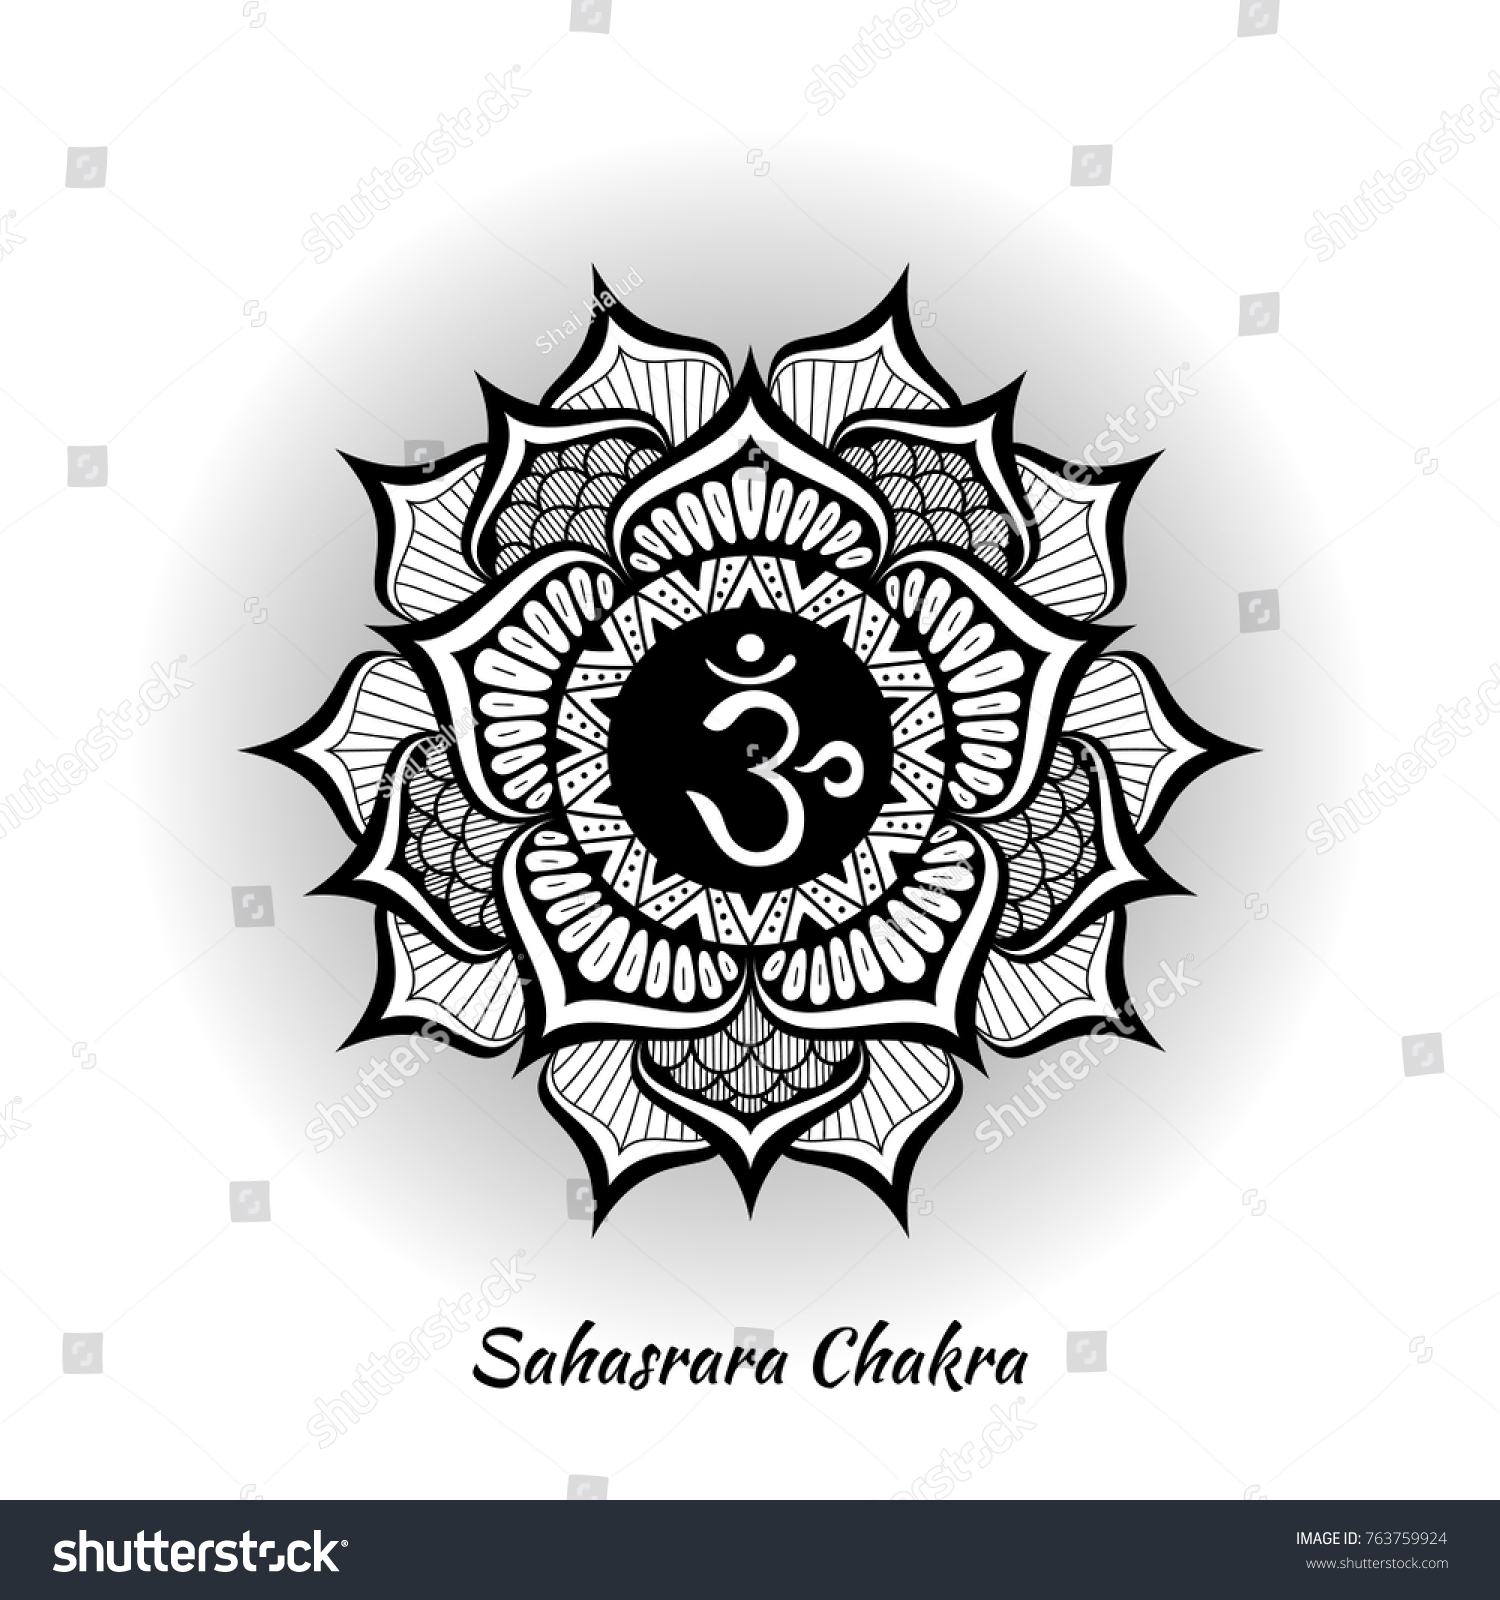 Sahasrara chakra symbol used hinduism buddhism stock vector sahasrara chakra symbol used in hinduism buddhism ayurveda the root chakra design for buycottarizona Gallery